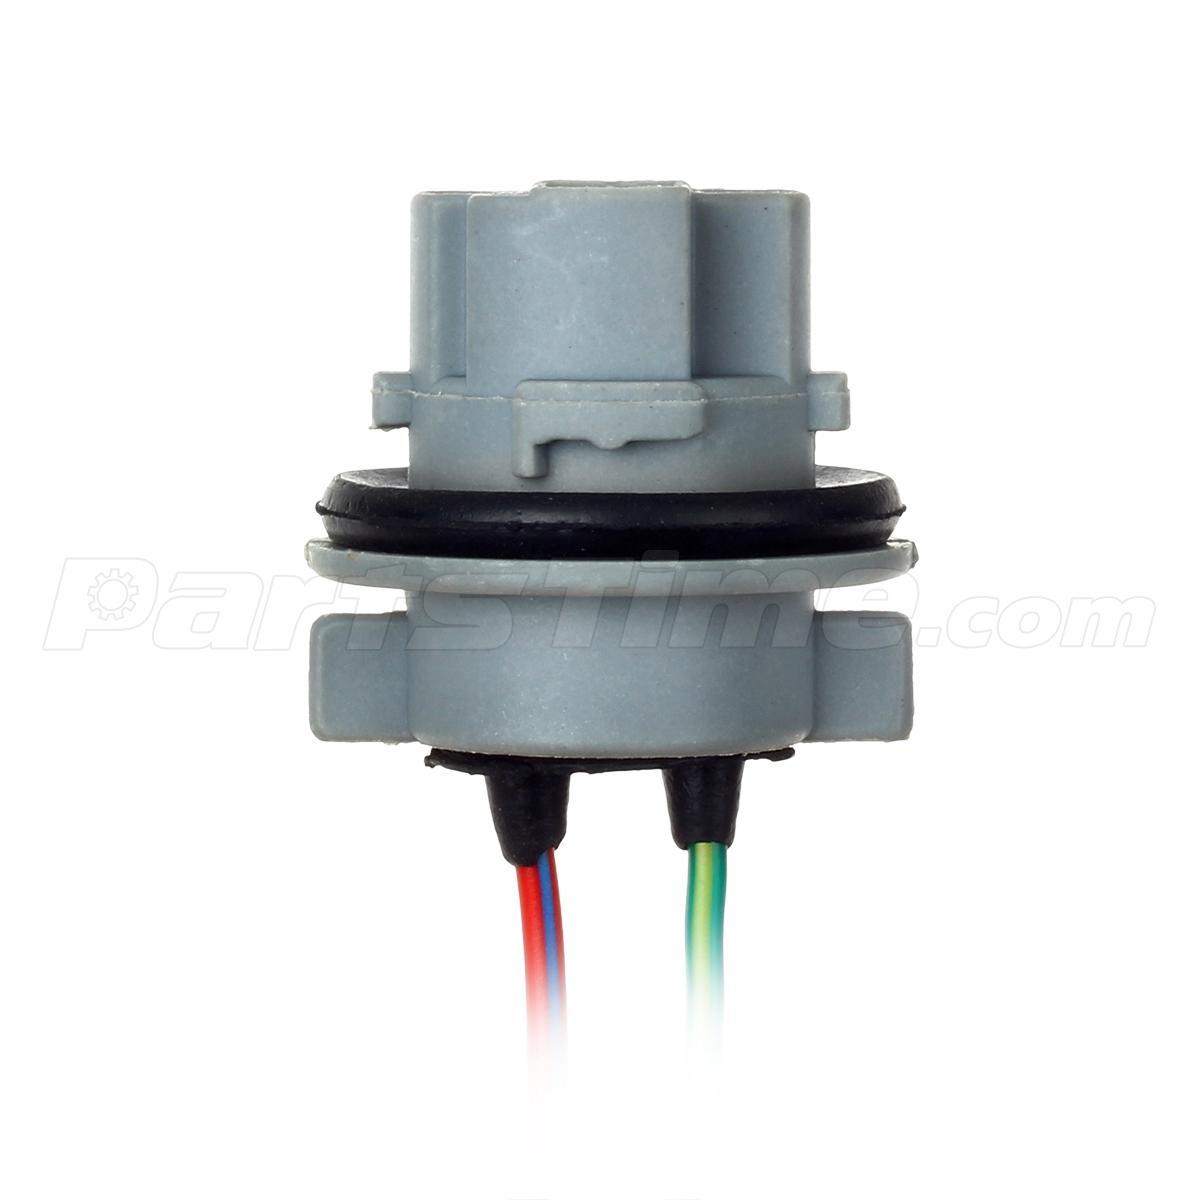 2x 7440 led bulb brake turn signal light sockets harness wire 2x 7443 led bulb brake turn signal light sockets harness wire plugs